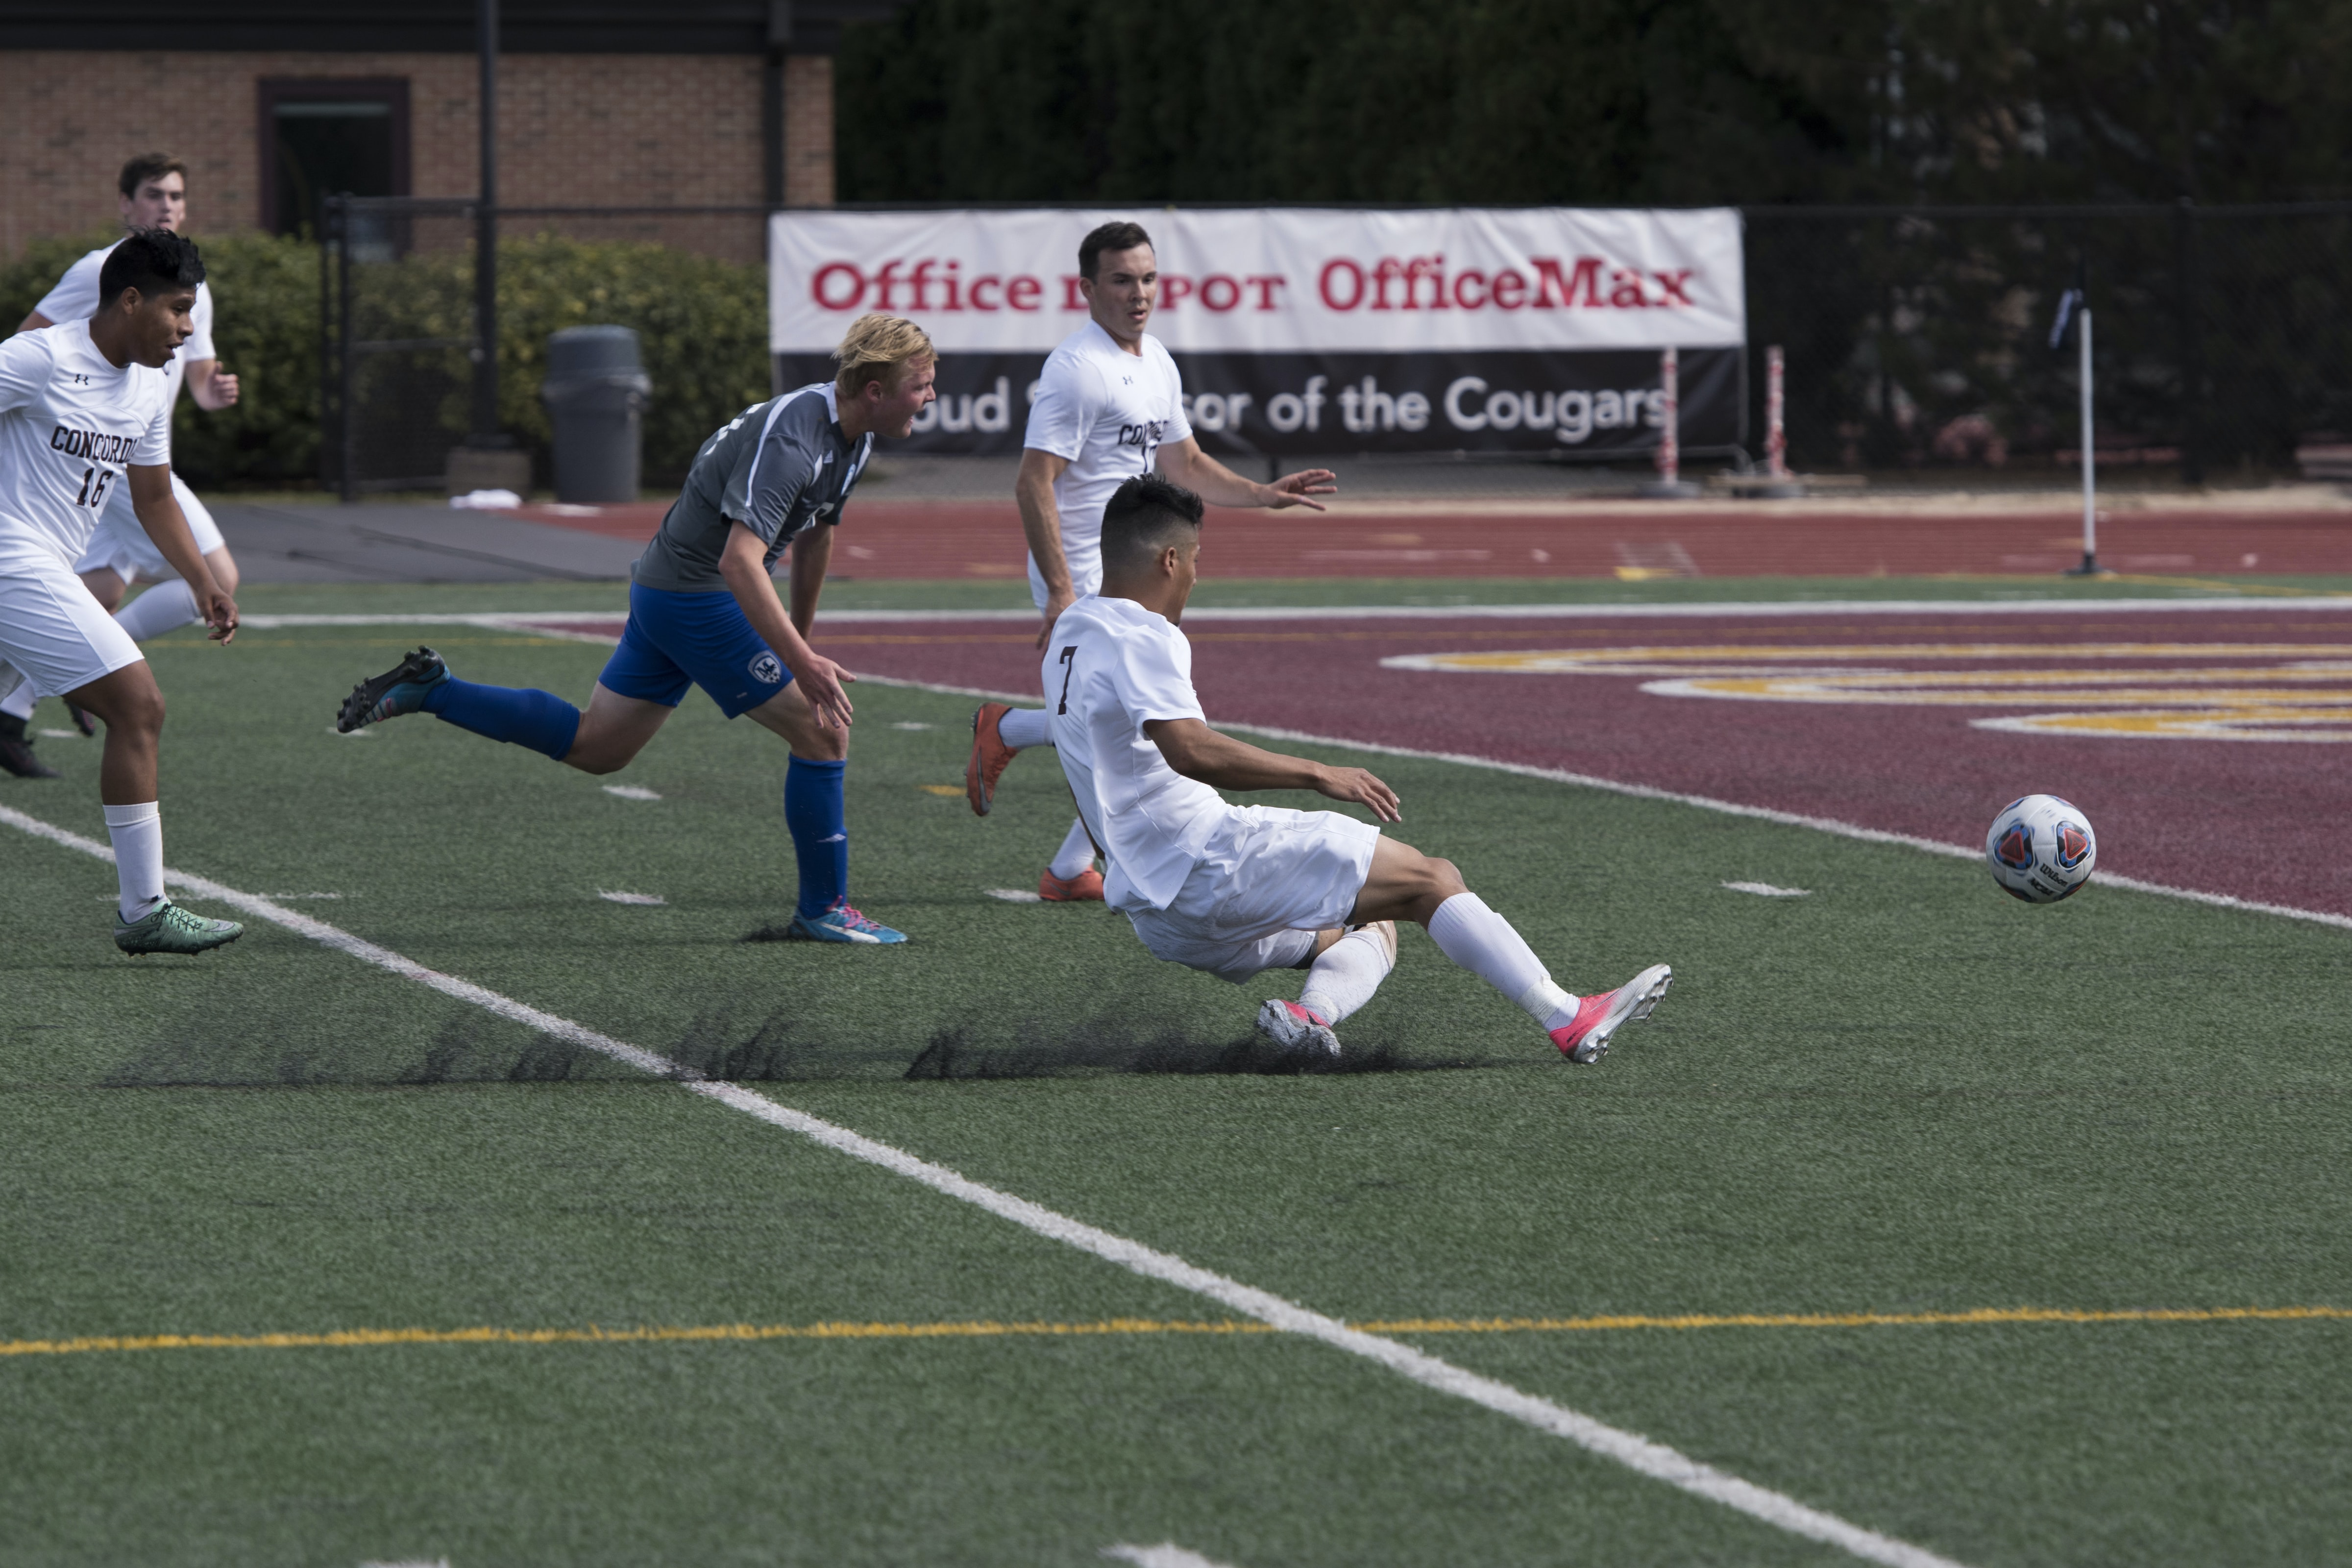 man near soccer ball on turf